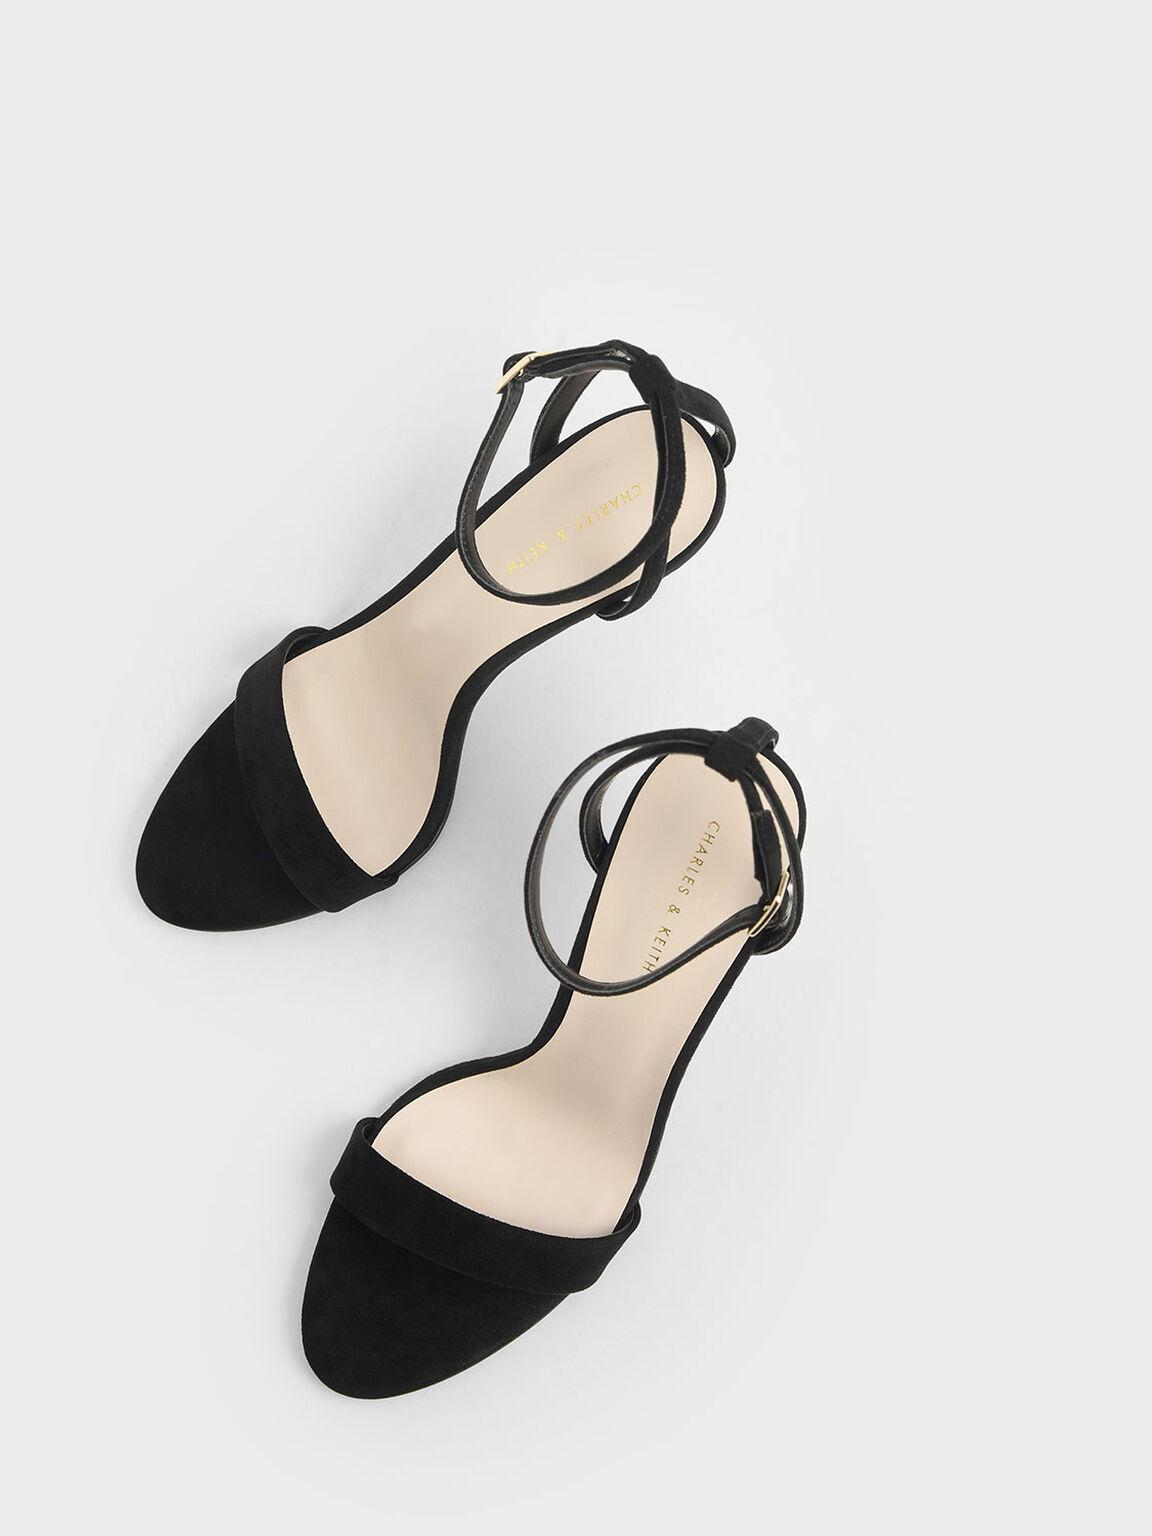 Textured Stiletto Heels, Black, hi-res